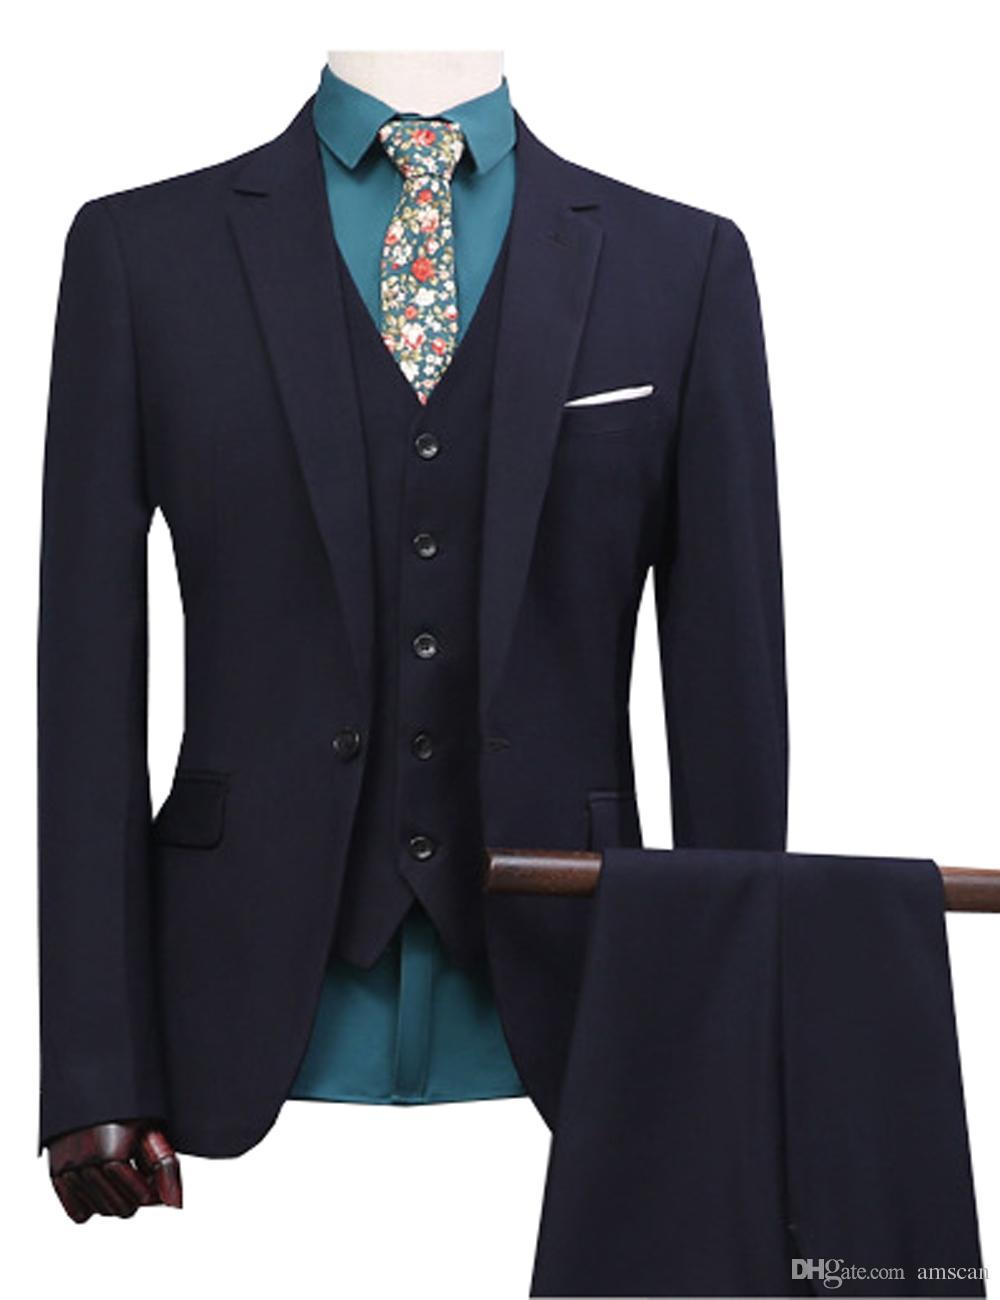 Men Suit Casual Single Breasted Suit Set Wedding Groom Stylish Prom Dress Men Party Wear 3 Pieces(Jacket+Vest+Pants) dsy044